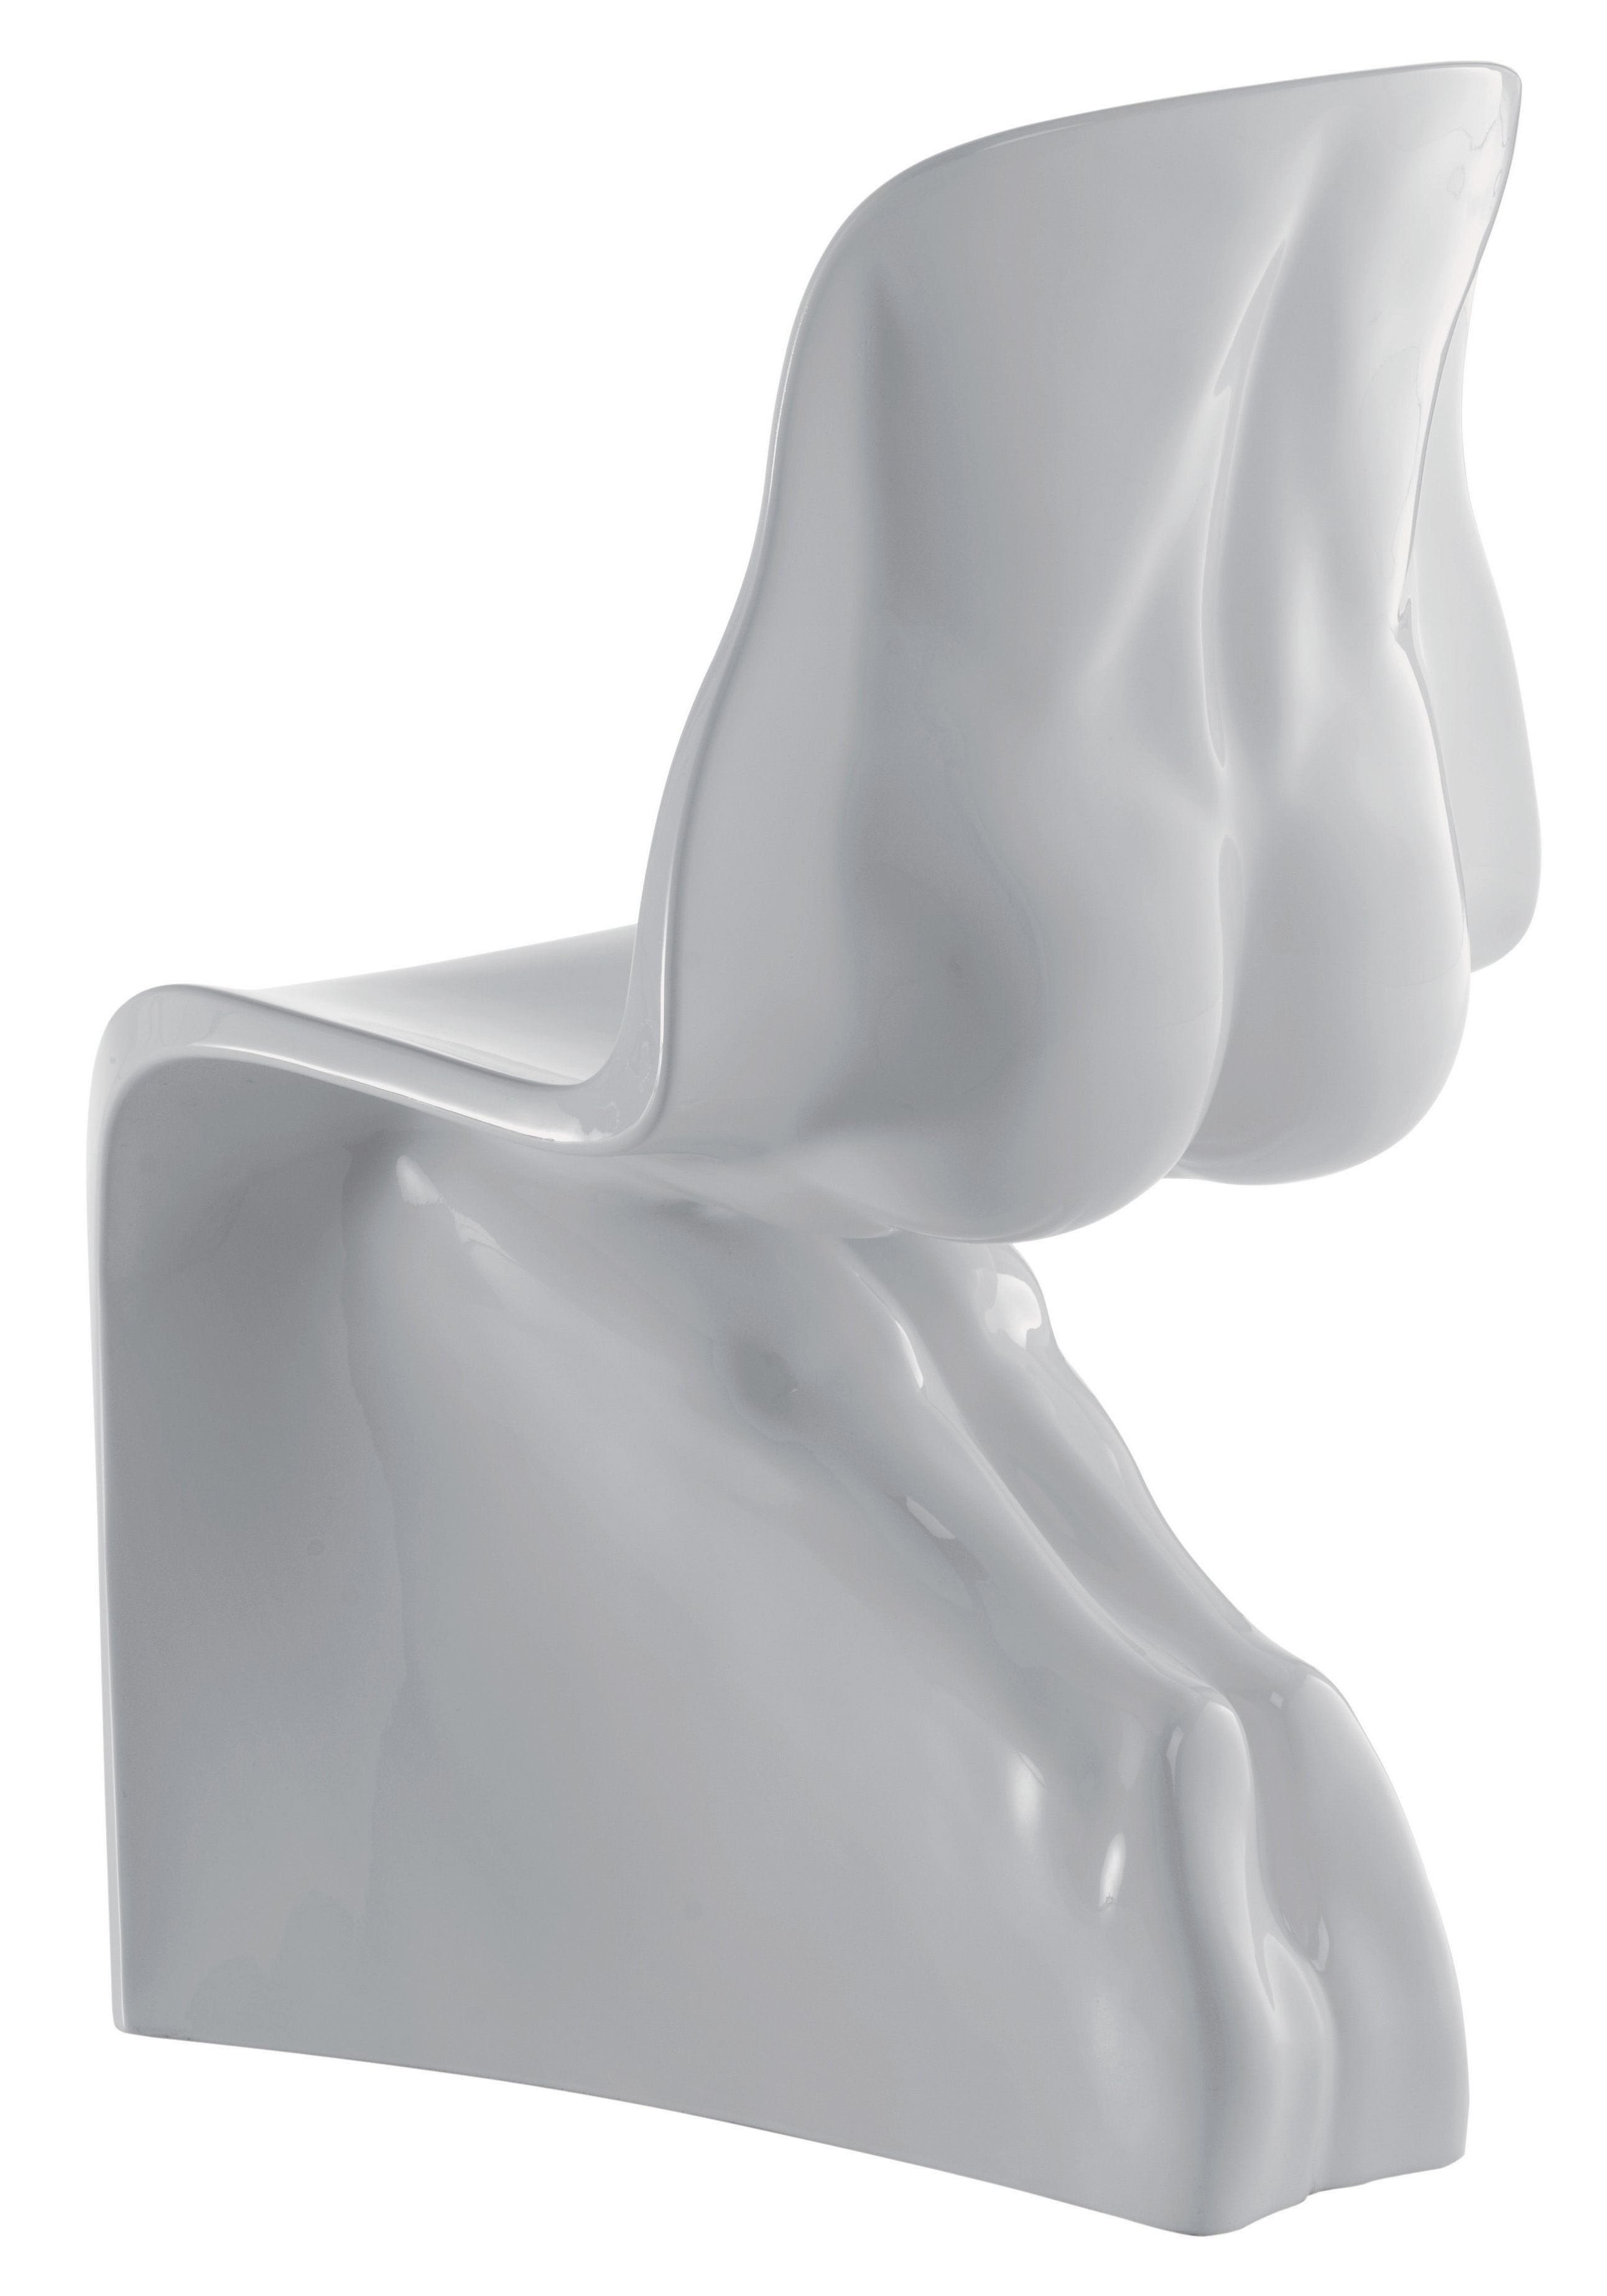 Möbel - Stühle  - Him Stuhl lackiert - Casamania - Weiß - Polyäthylen